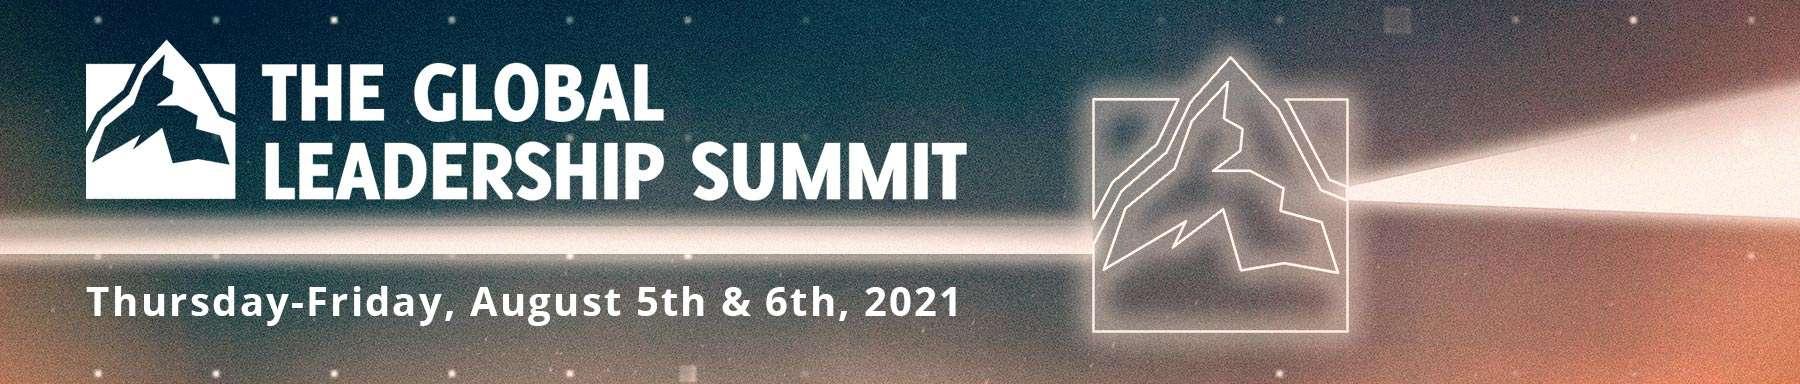 Global Leadership Summit - GLS - Live Streamed Event